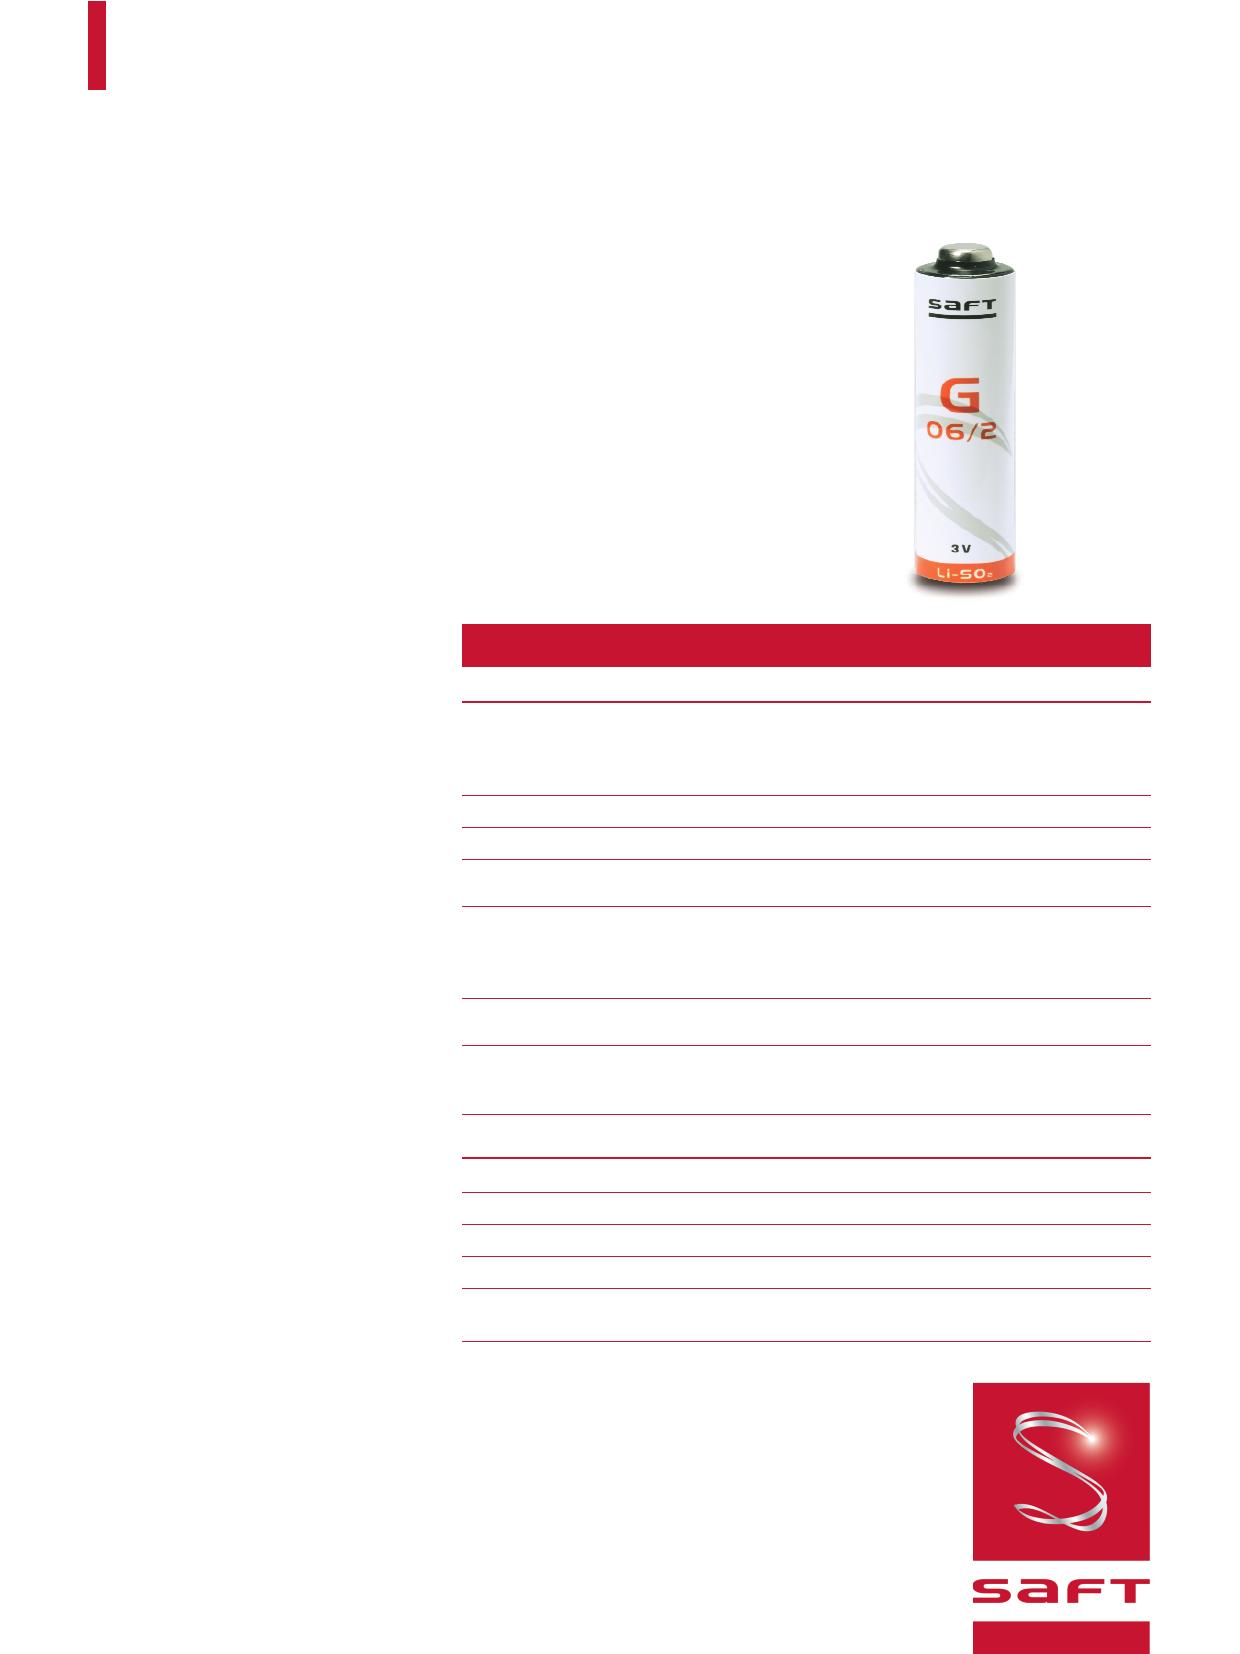 G02 даташит PDF